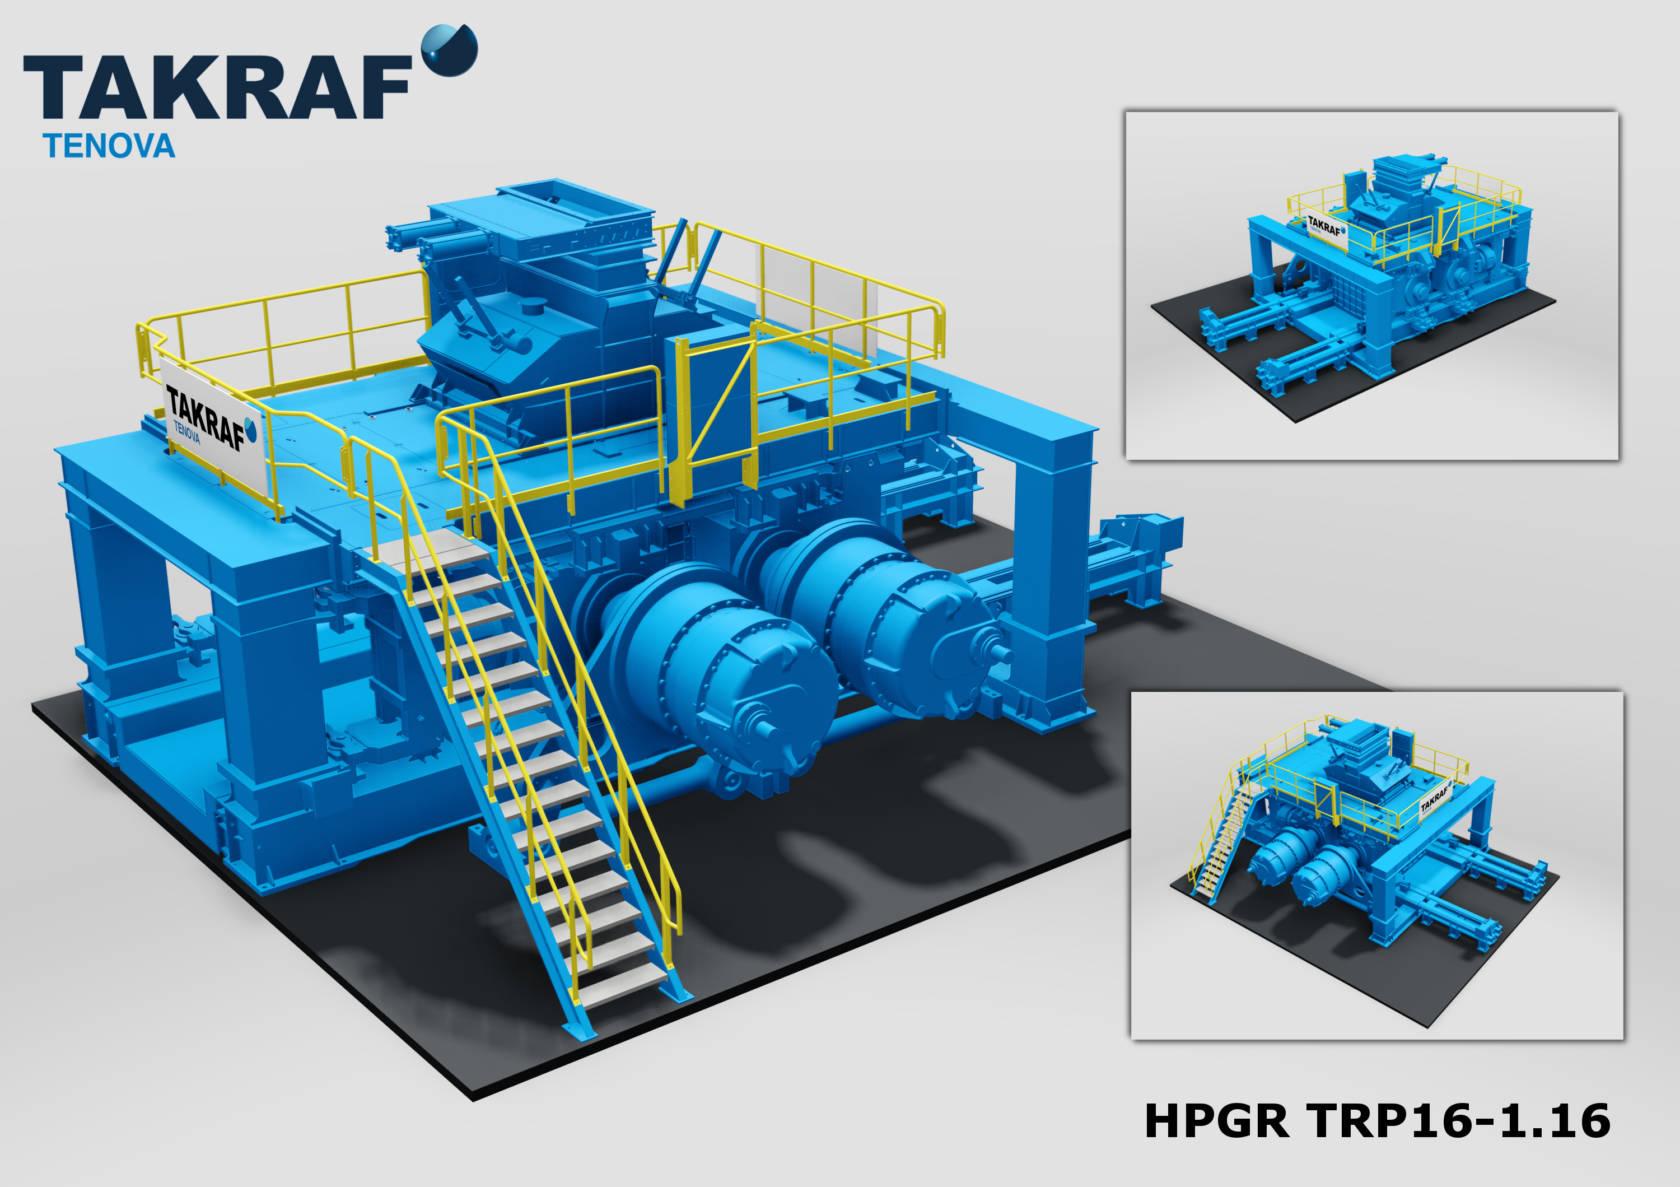 HPGR takrafmodel